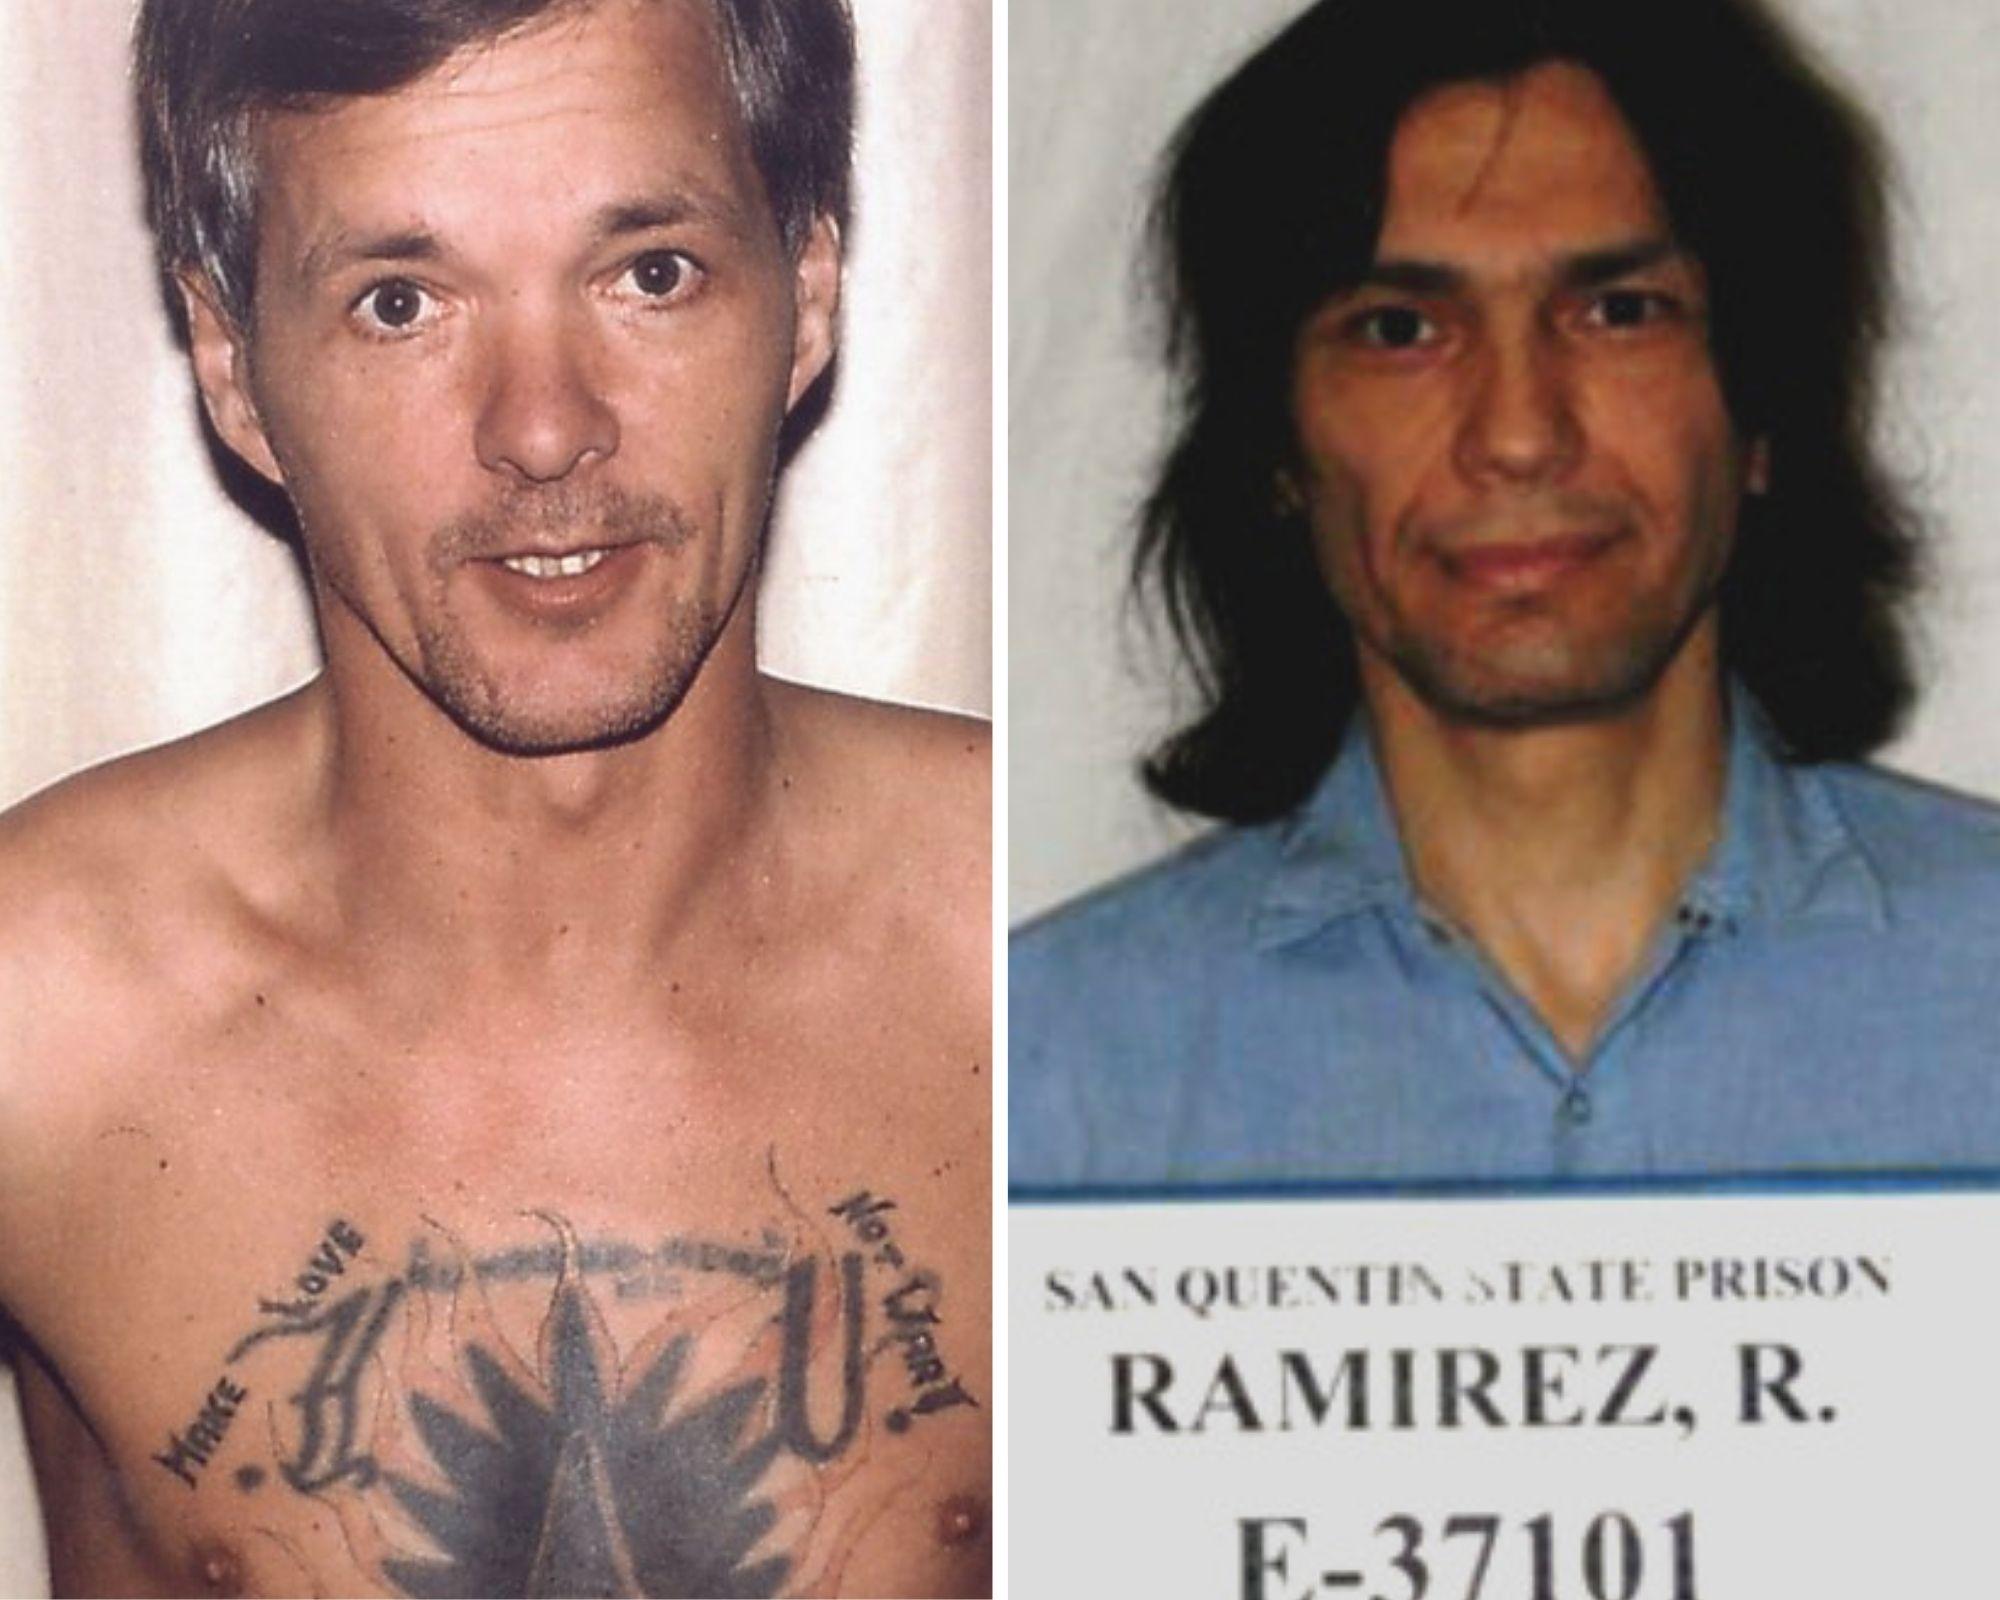 Унтервегер (слева) и Рамирес. Фото © Twitter / LPontheleft / San Quentin State Prison